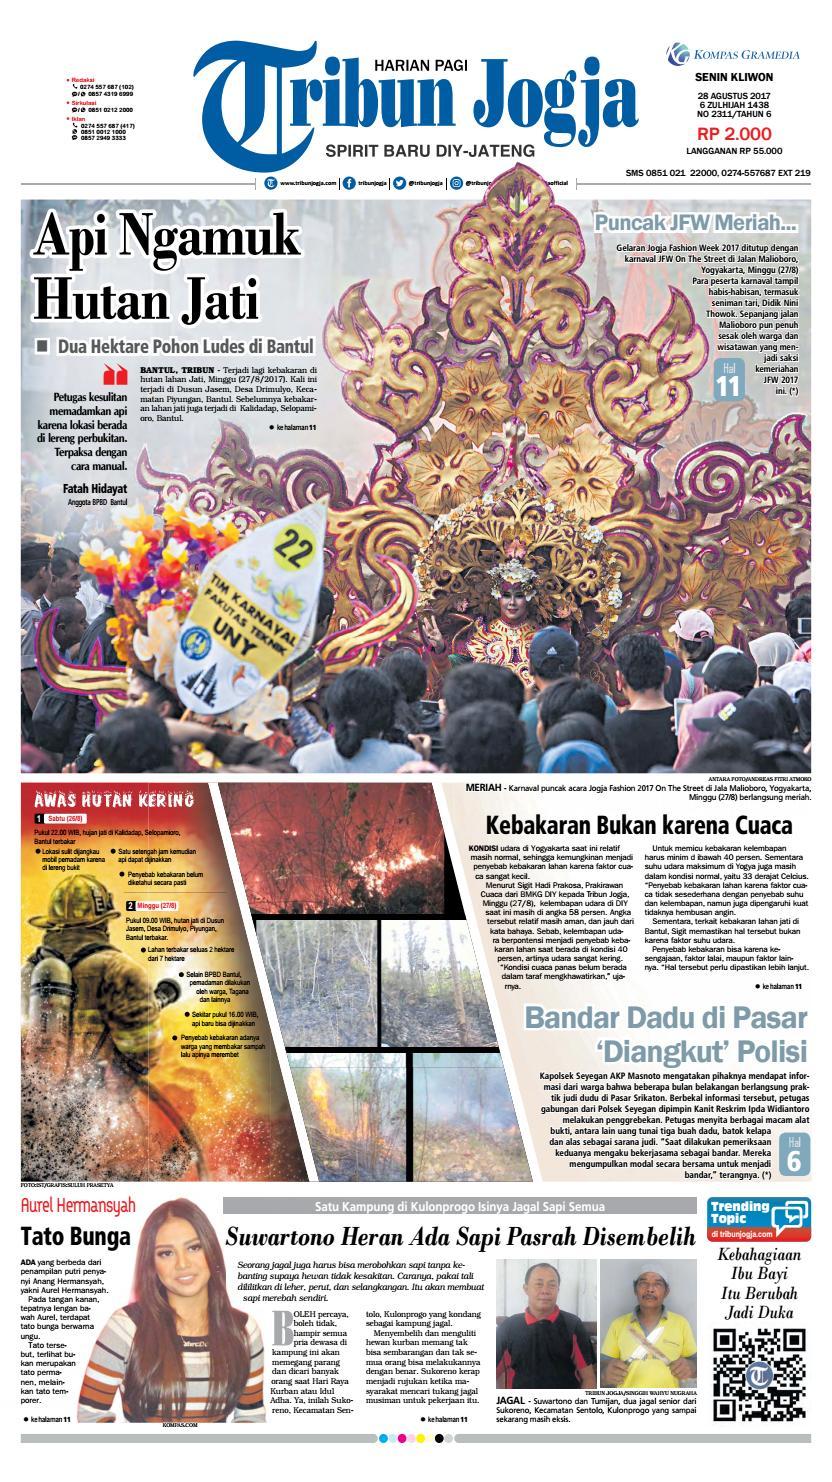 Tribunjogja 28 08 2017 By Tribun Jogja Issuu Produk Ukm Bumn Tekiro Tang Buaya 10